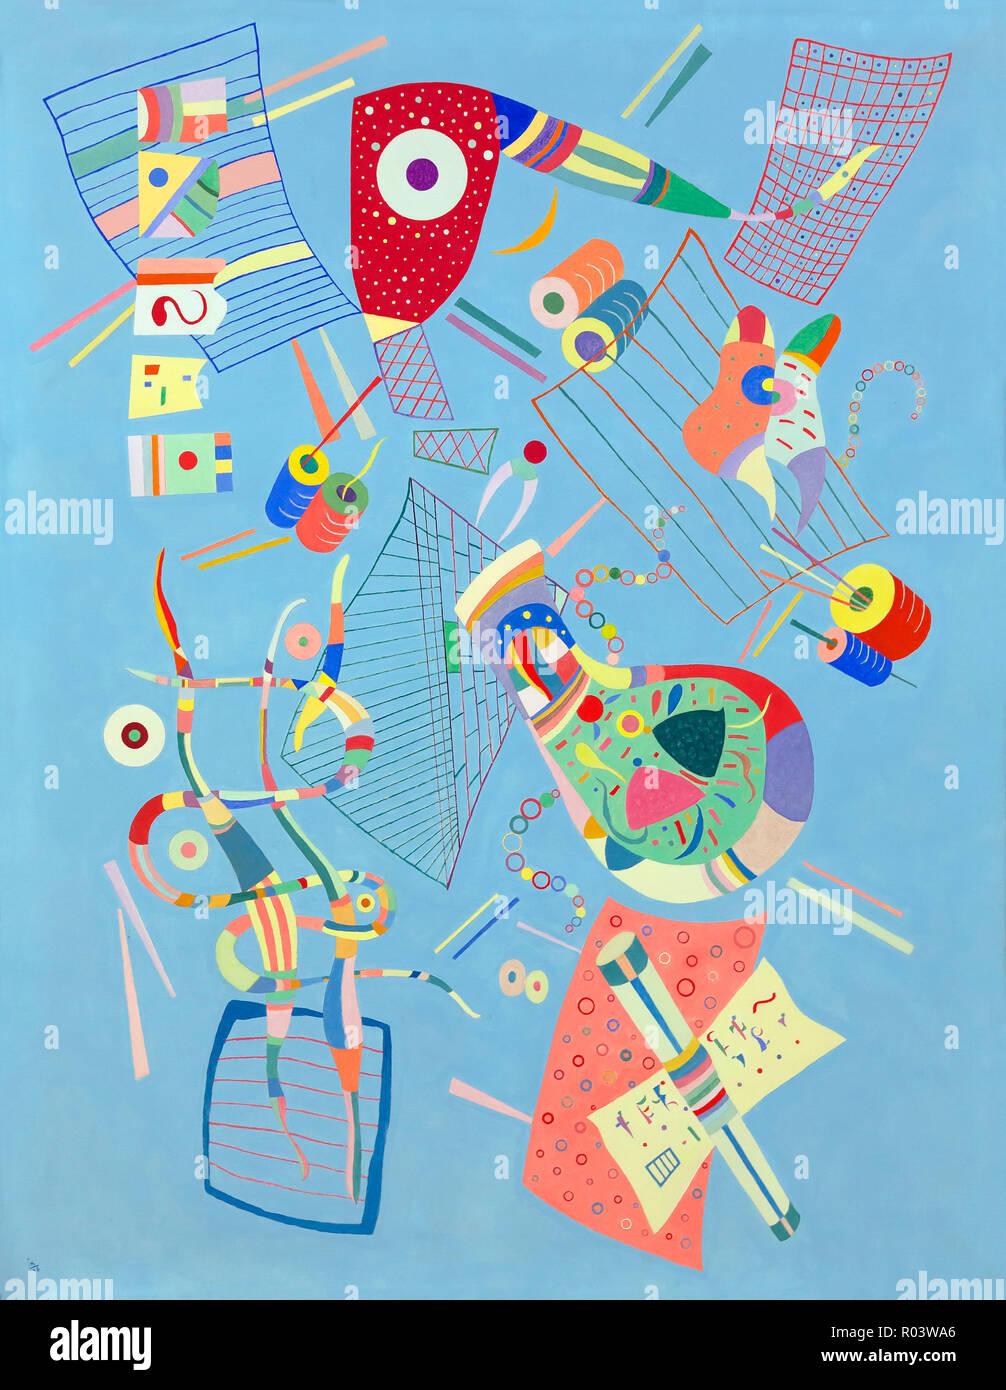 Gelassenheit, Wassily Kandinsky, 1938, Zürich, Kunsthaus, Zürich, Schweiz, Europa Stockbild